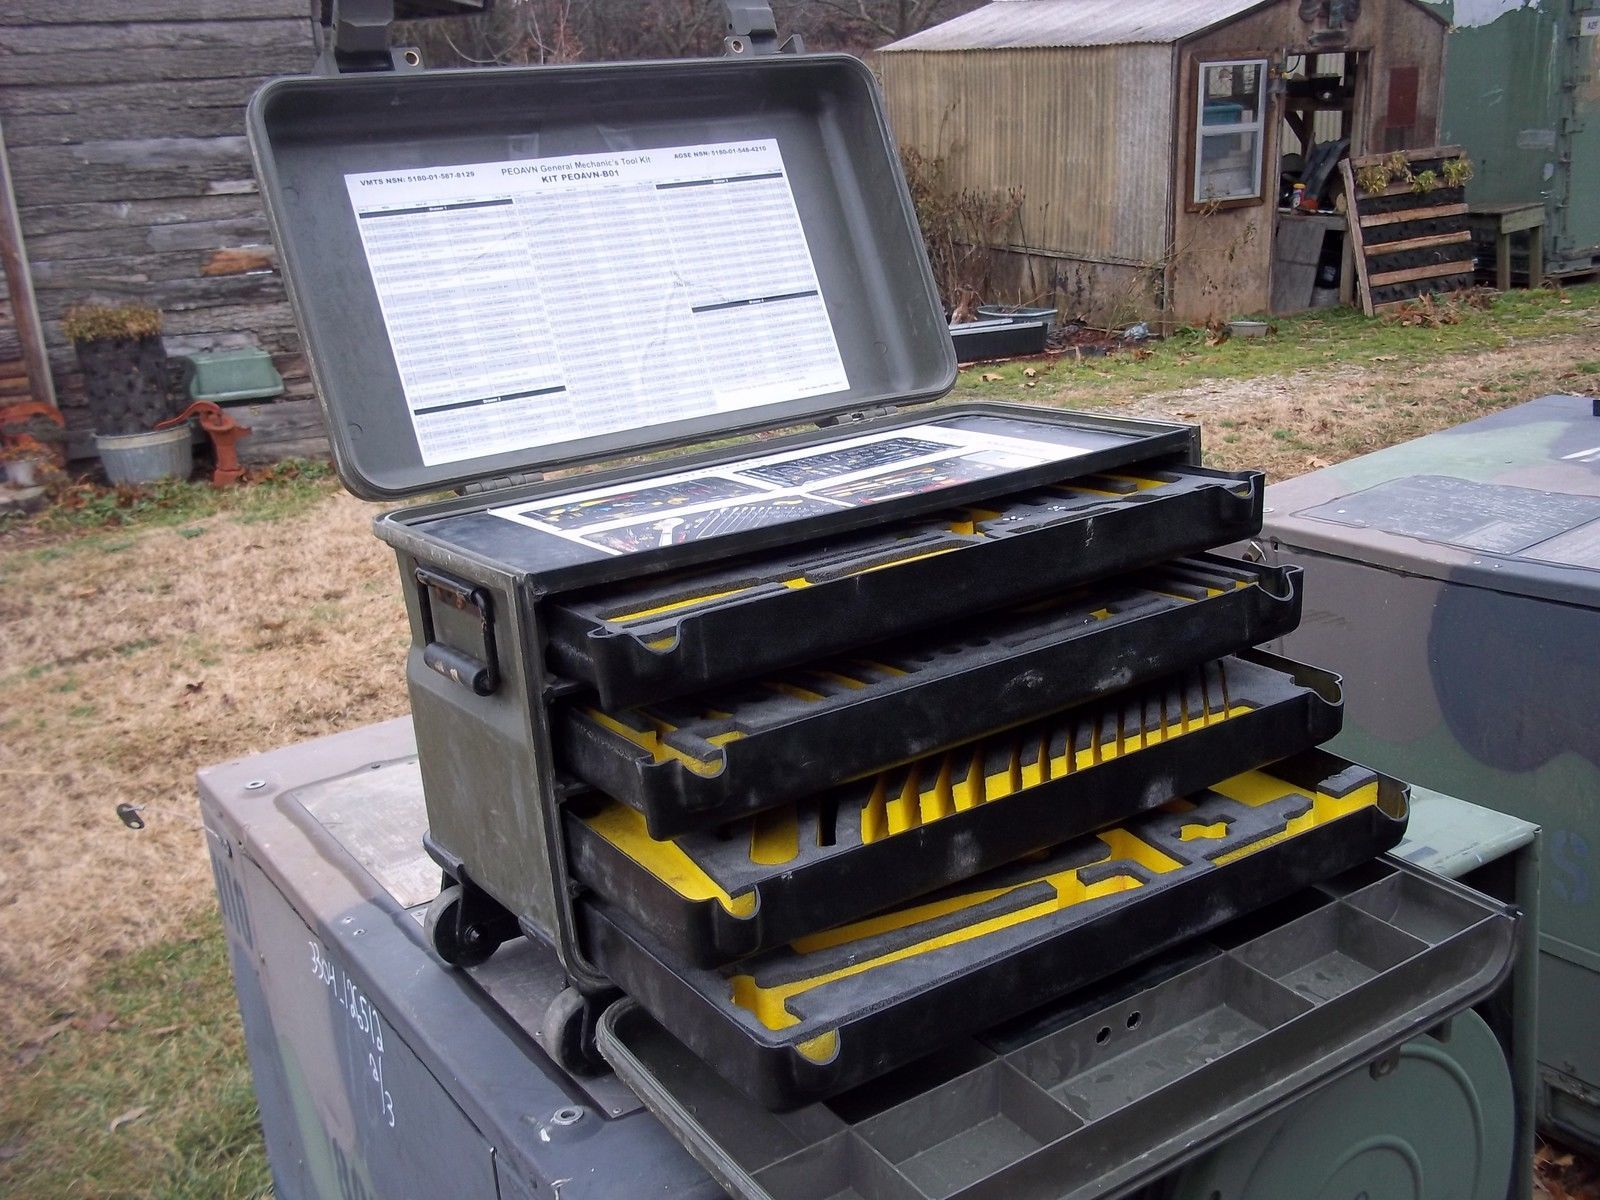 Military Surplus General Mechanics Tool Kit Box Kipper Truck Trailer Tent Army Trailer Tent Mechanic Tools Military Surplus